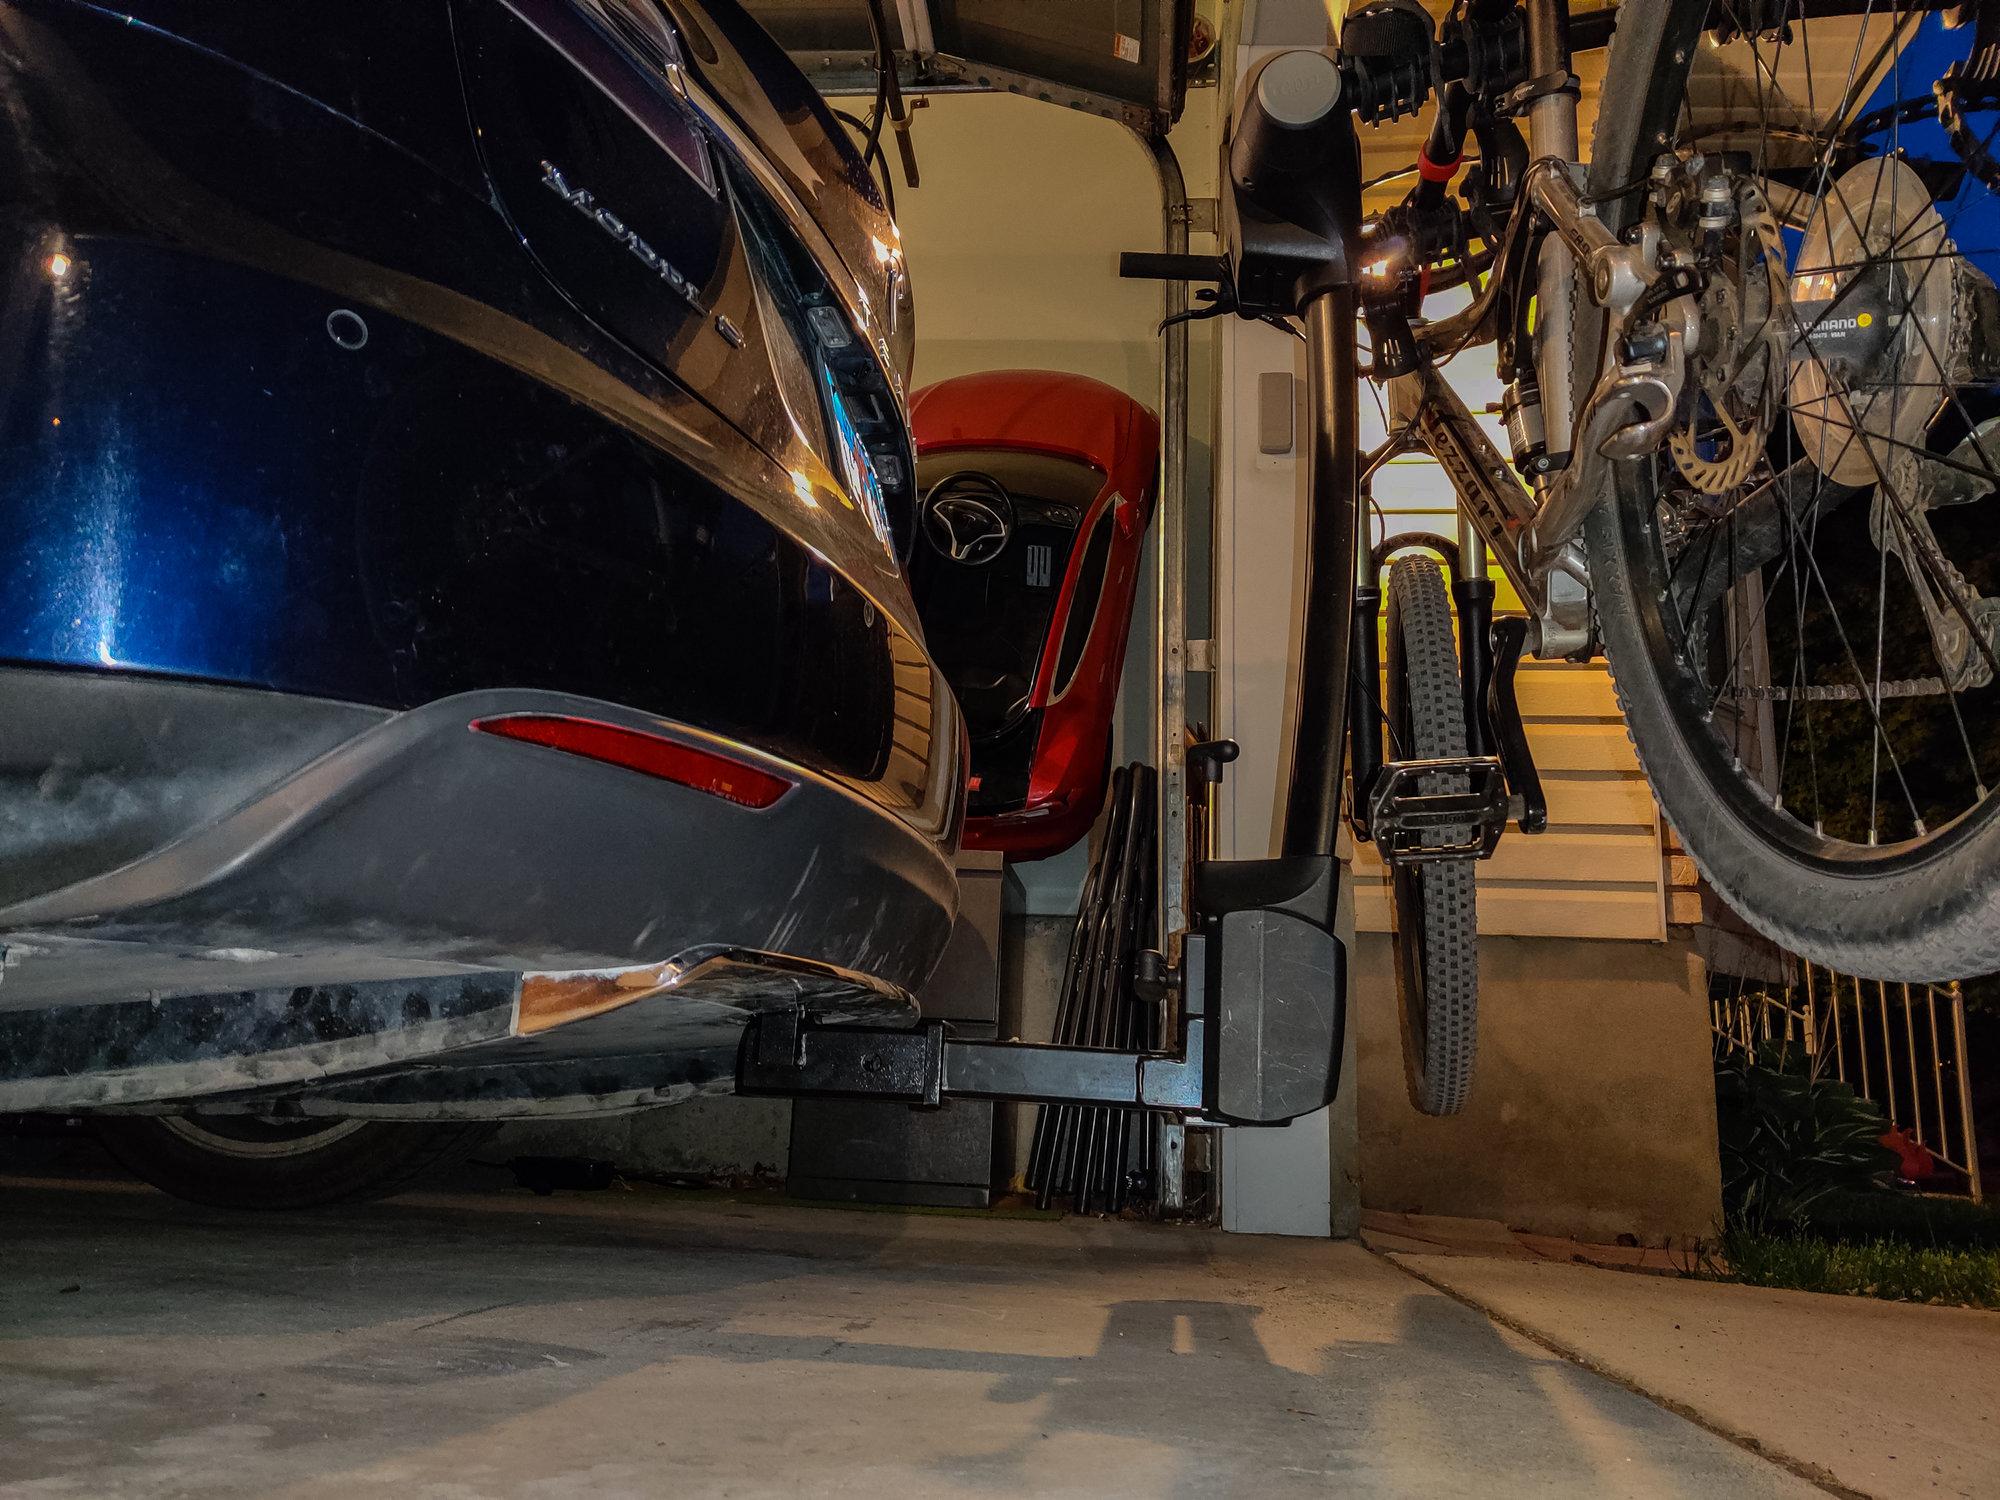 2020 05 30 Tesla Model S Trailer Hitch Installation 068.jpg